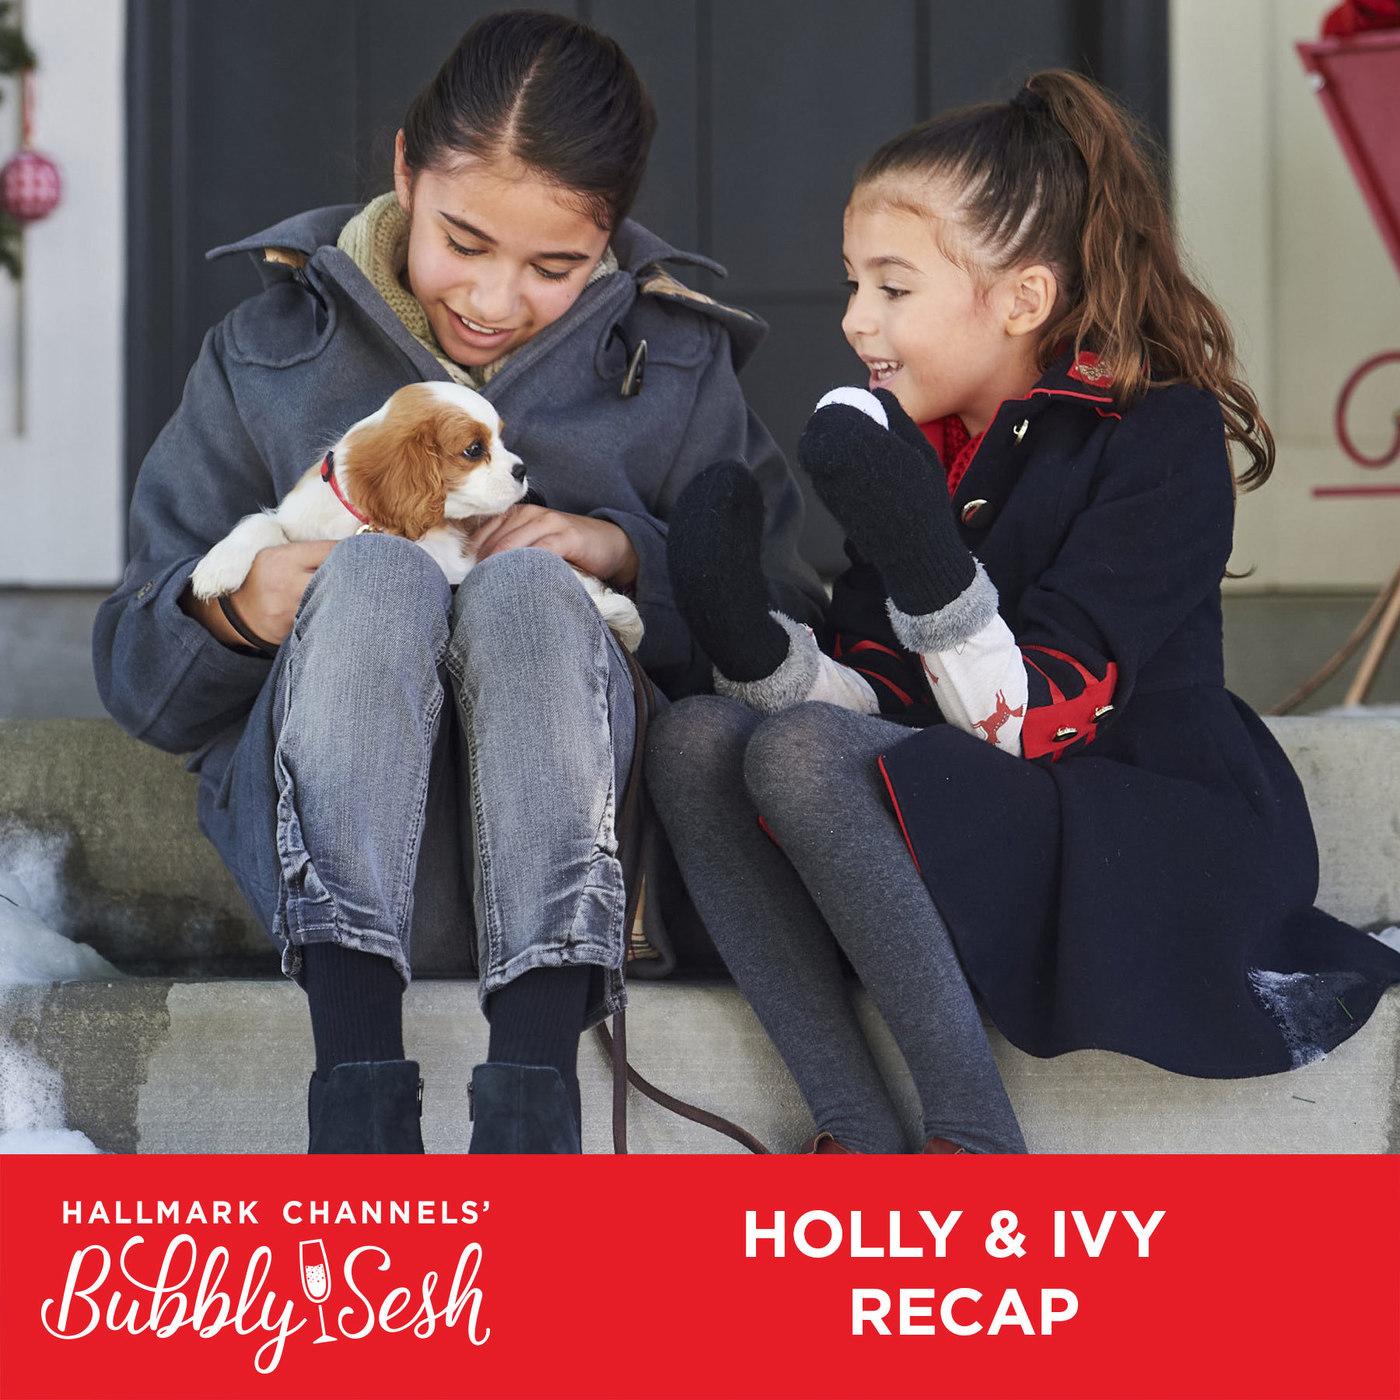 Holly & Ivy Recap